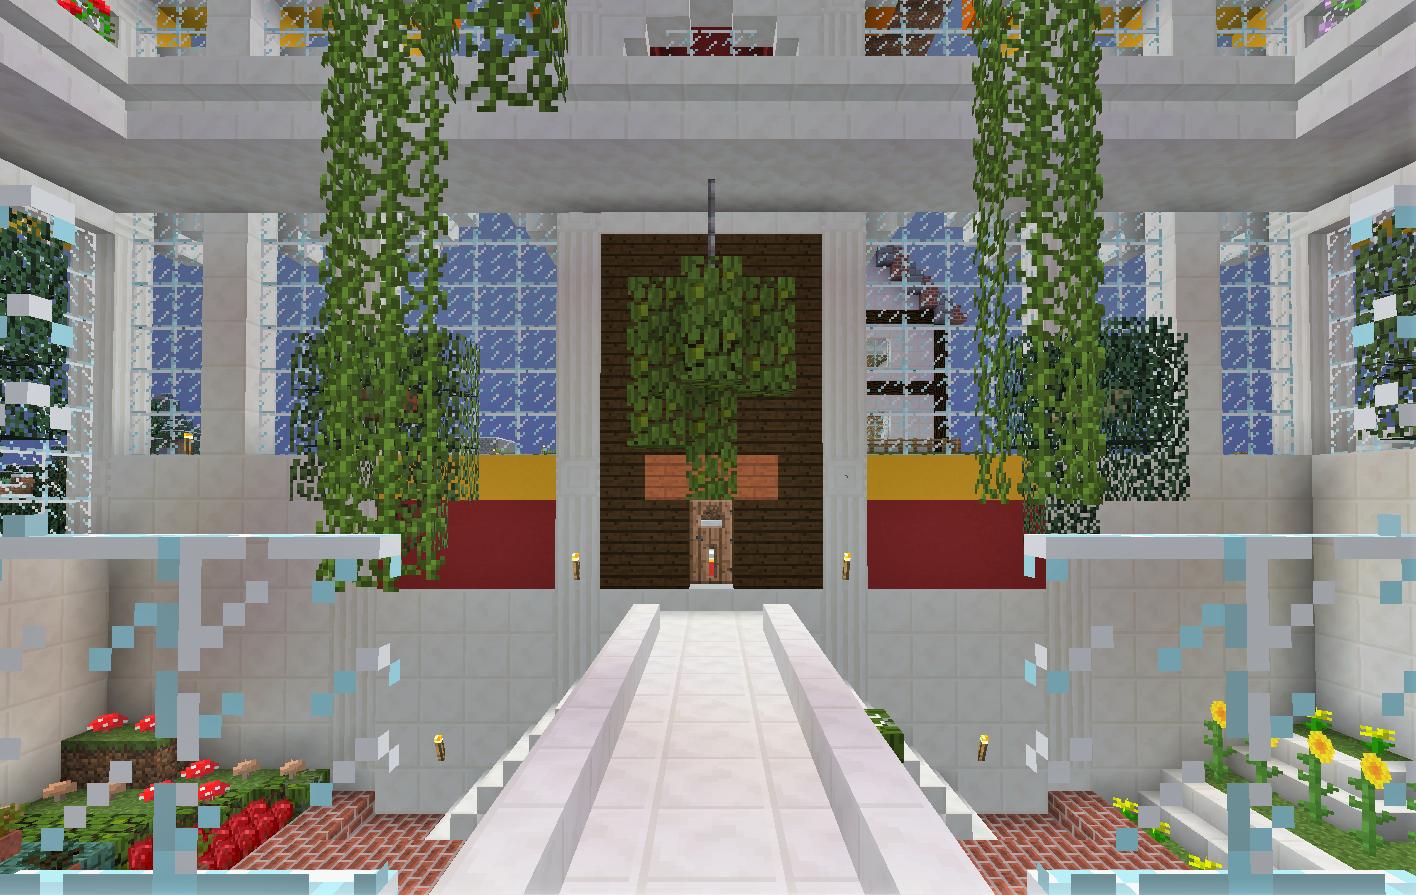 入口側.png